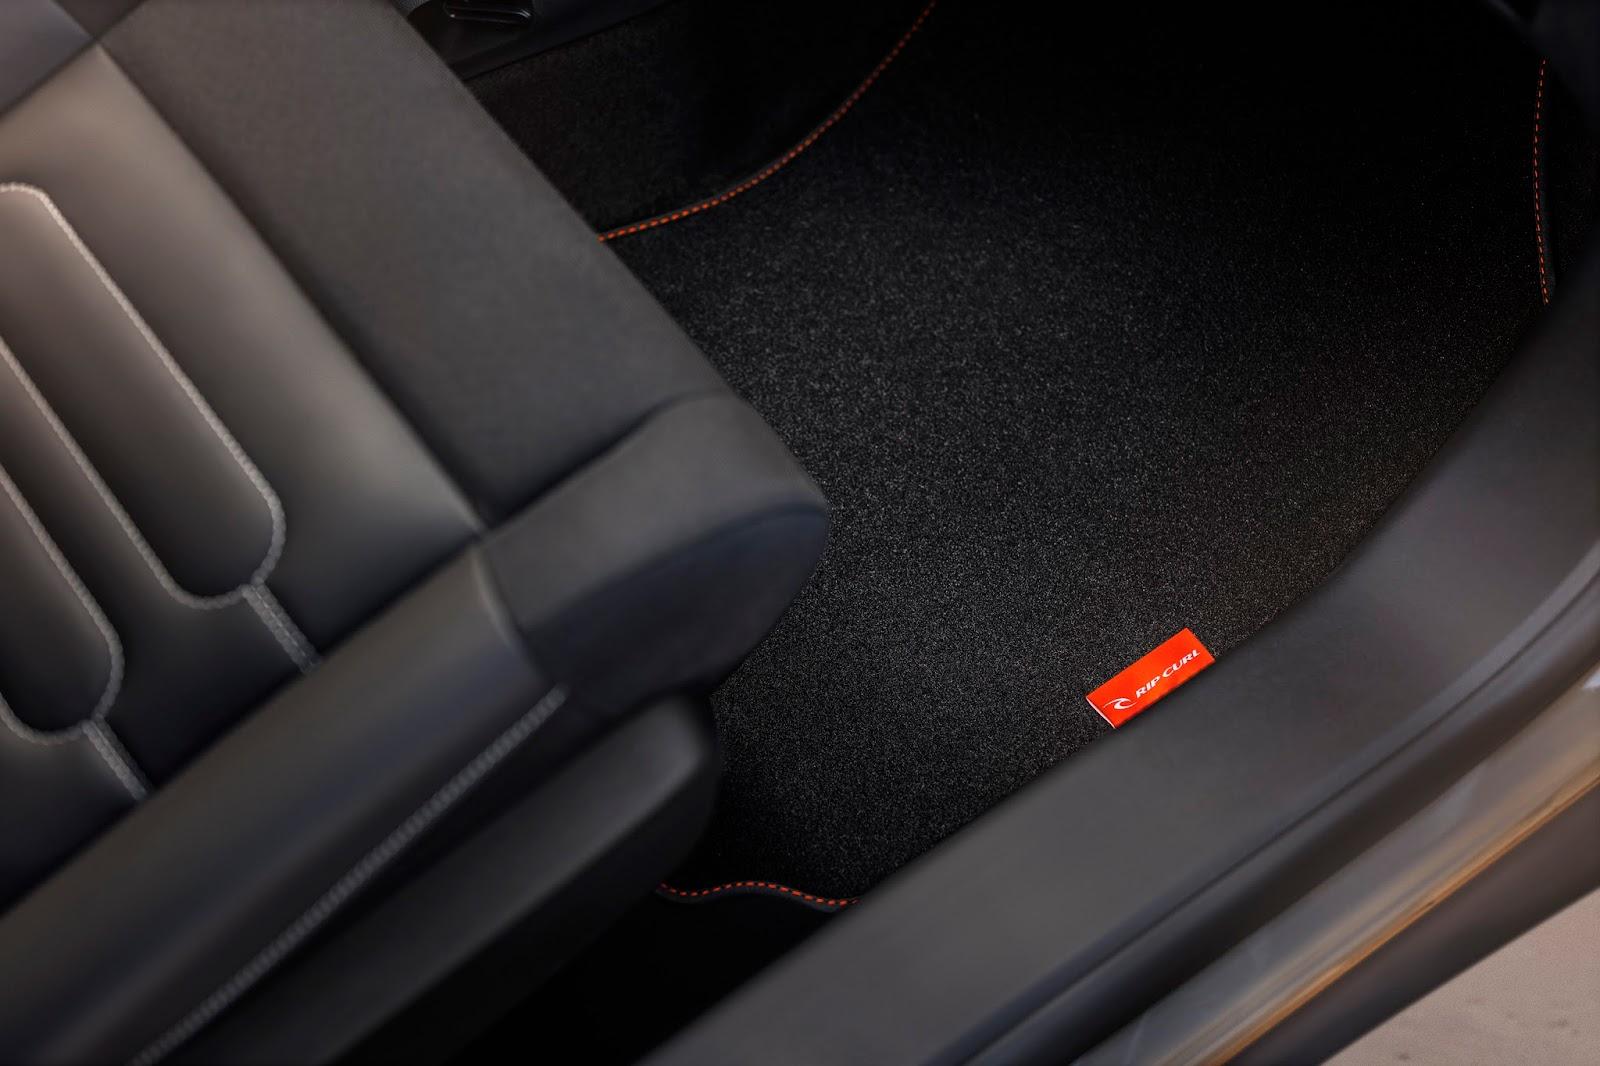 CL%2B16.015.024 Με 5 Παγκόσμιες Πρεμιέρες η Citroën Στο Σαλόνι Αυτοκινήτου της Γενεύης